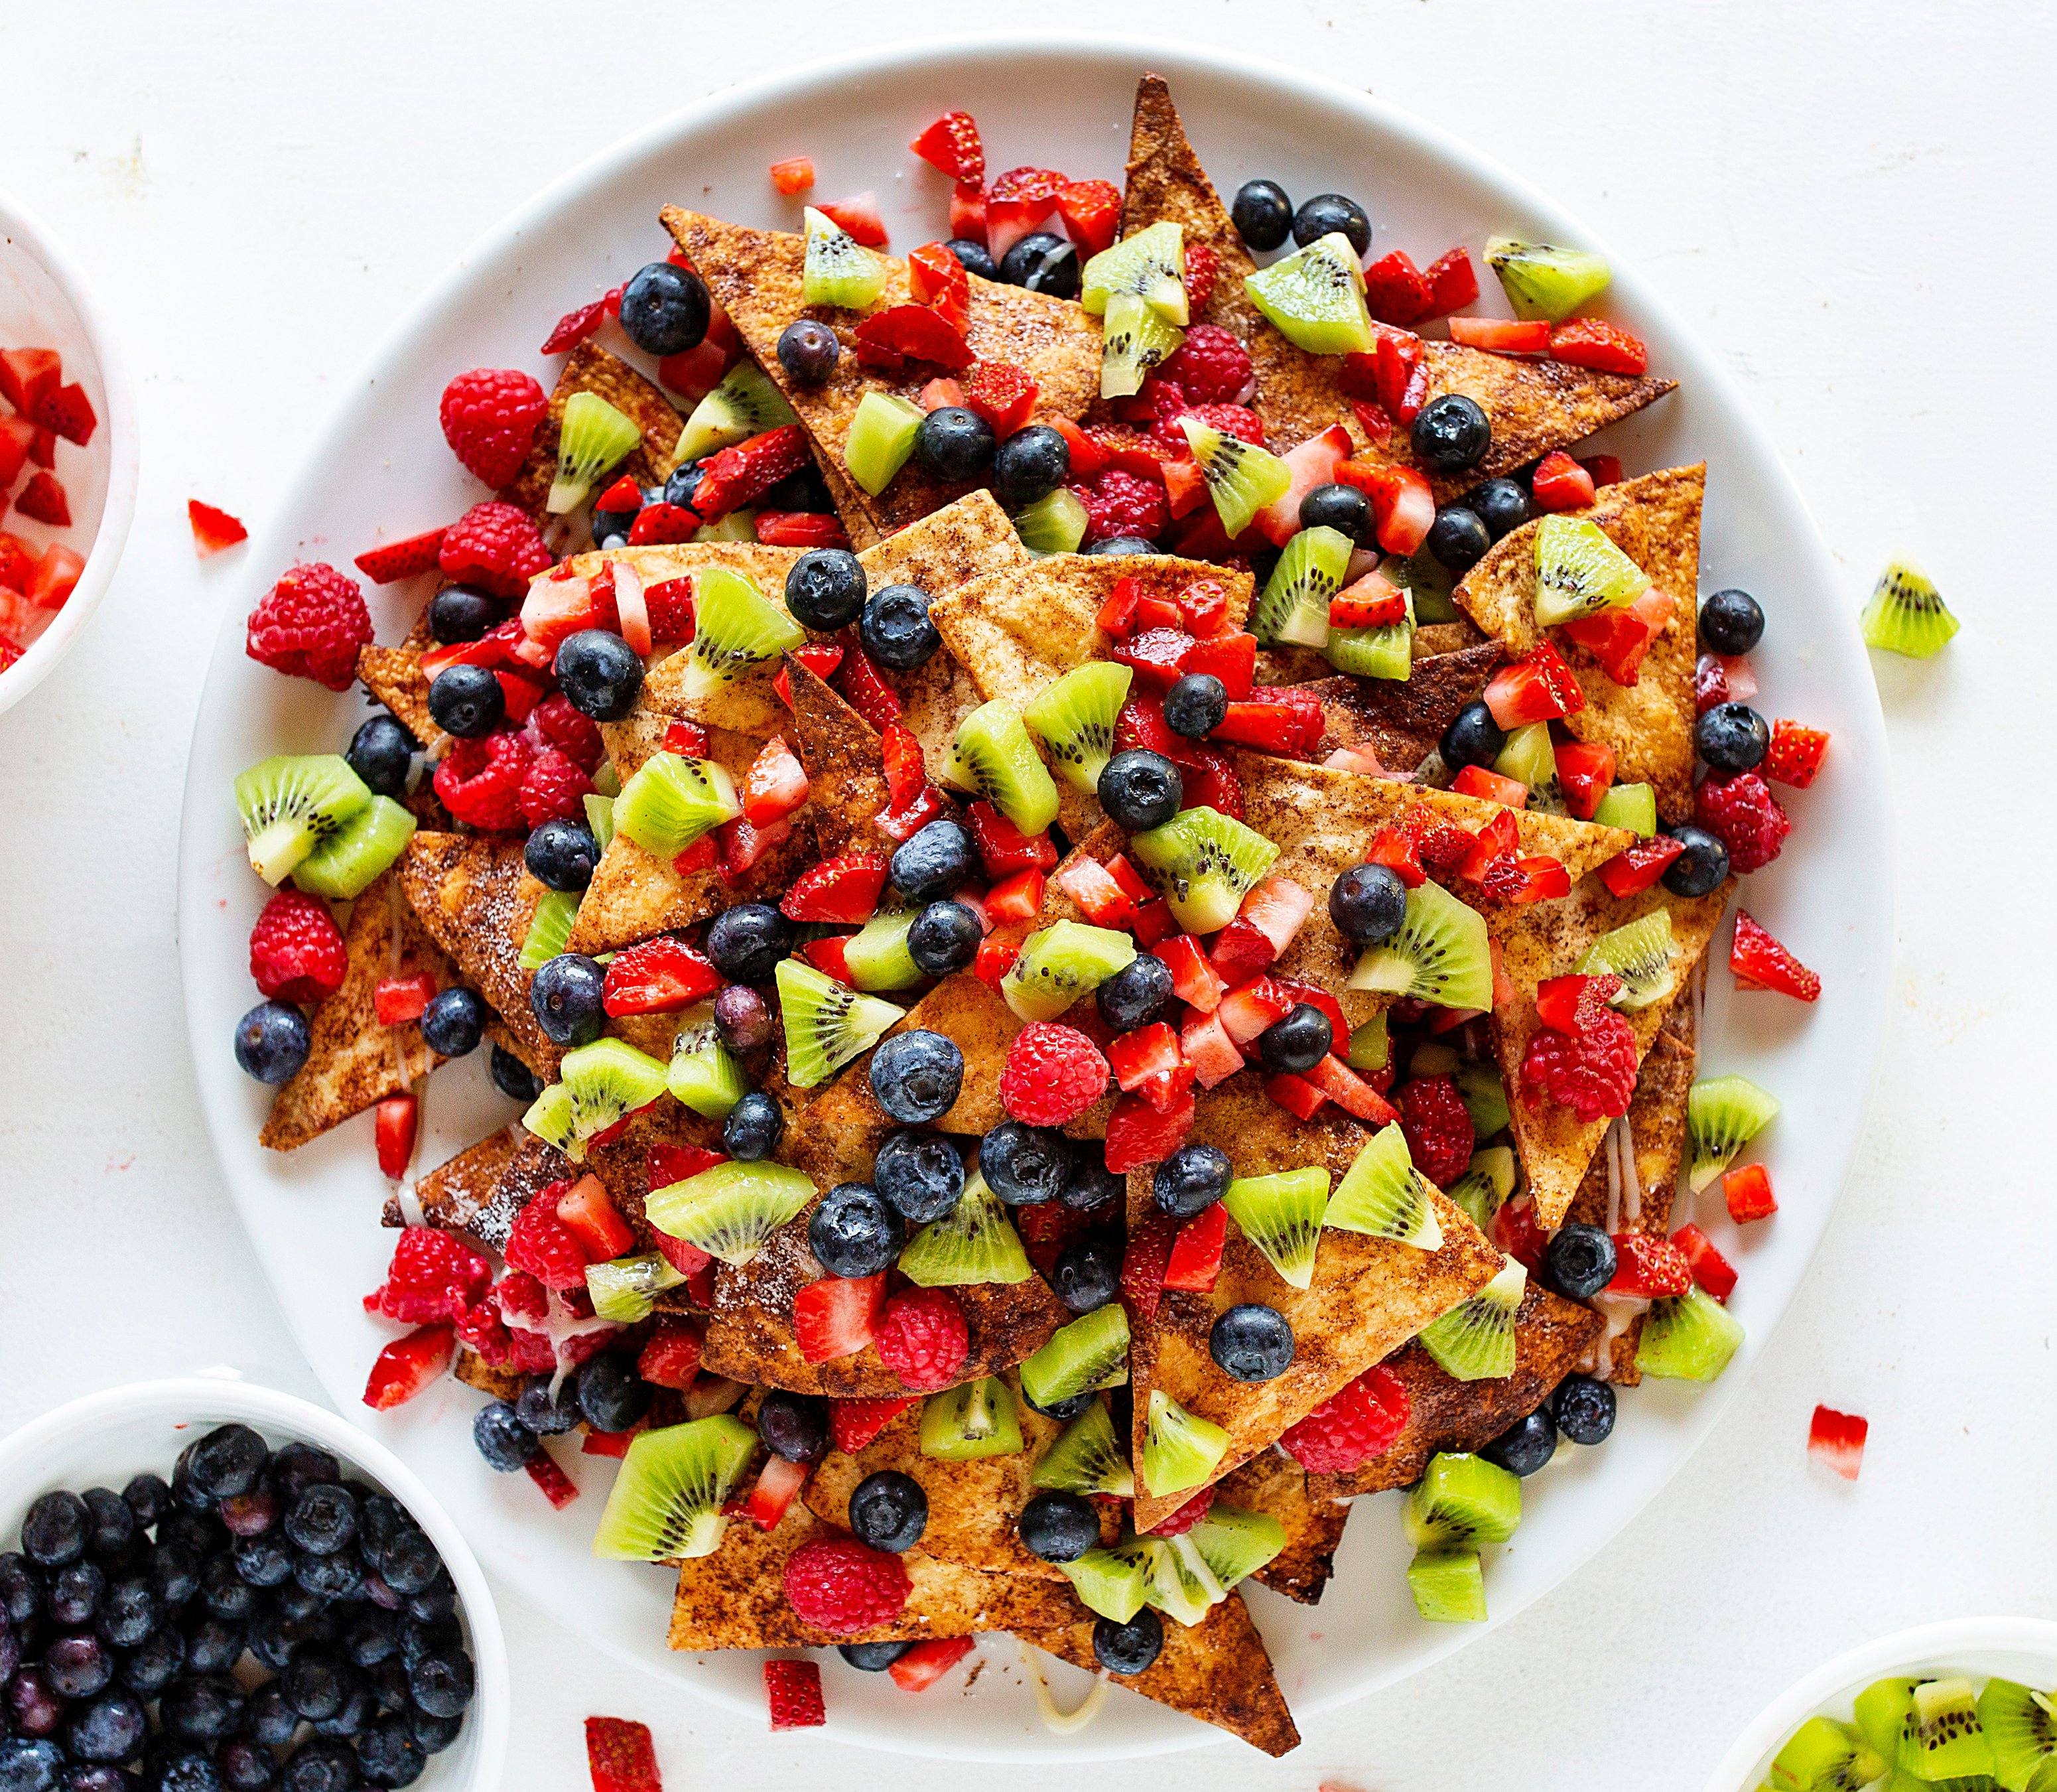 The Best Fruit for Dessert Nachos